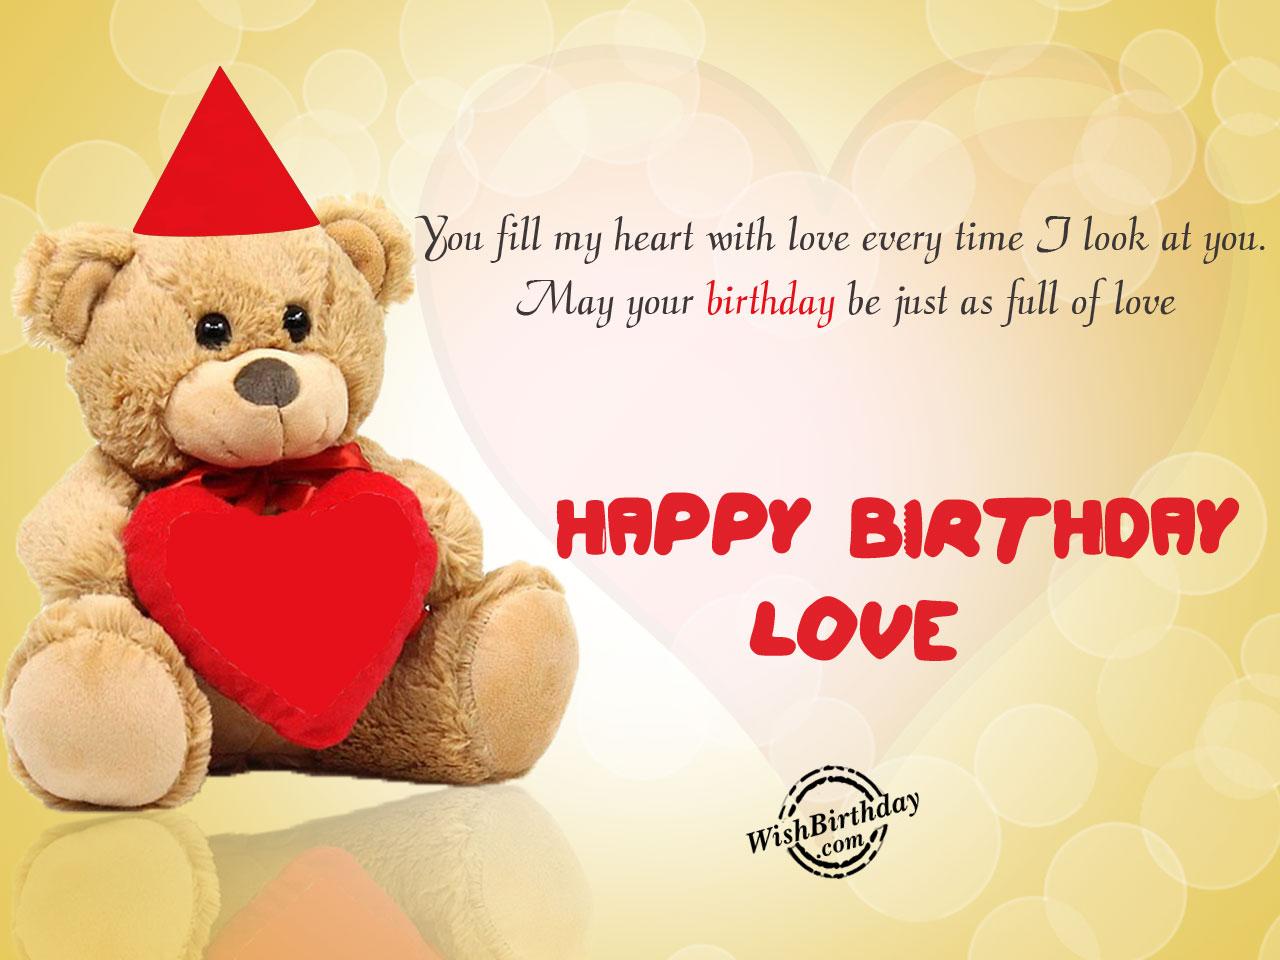 Birthday Wishes For Boyfriend Birthday Images Pictures – Birthday Greeting for Boyfriend